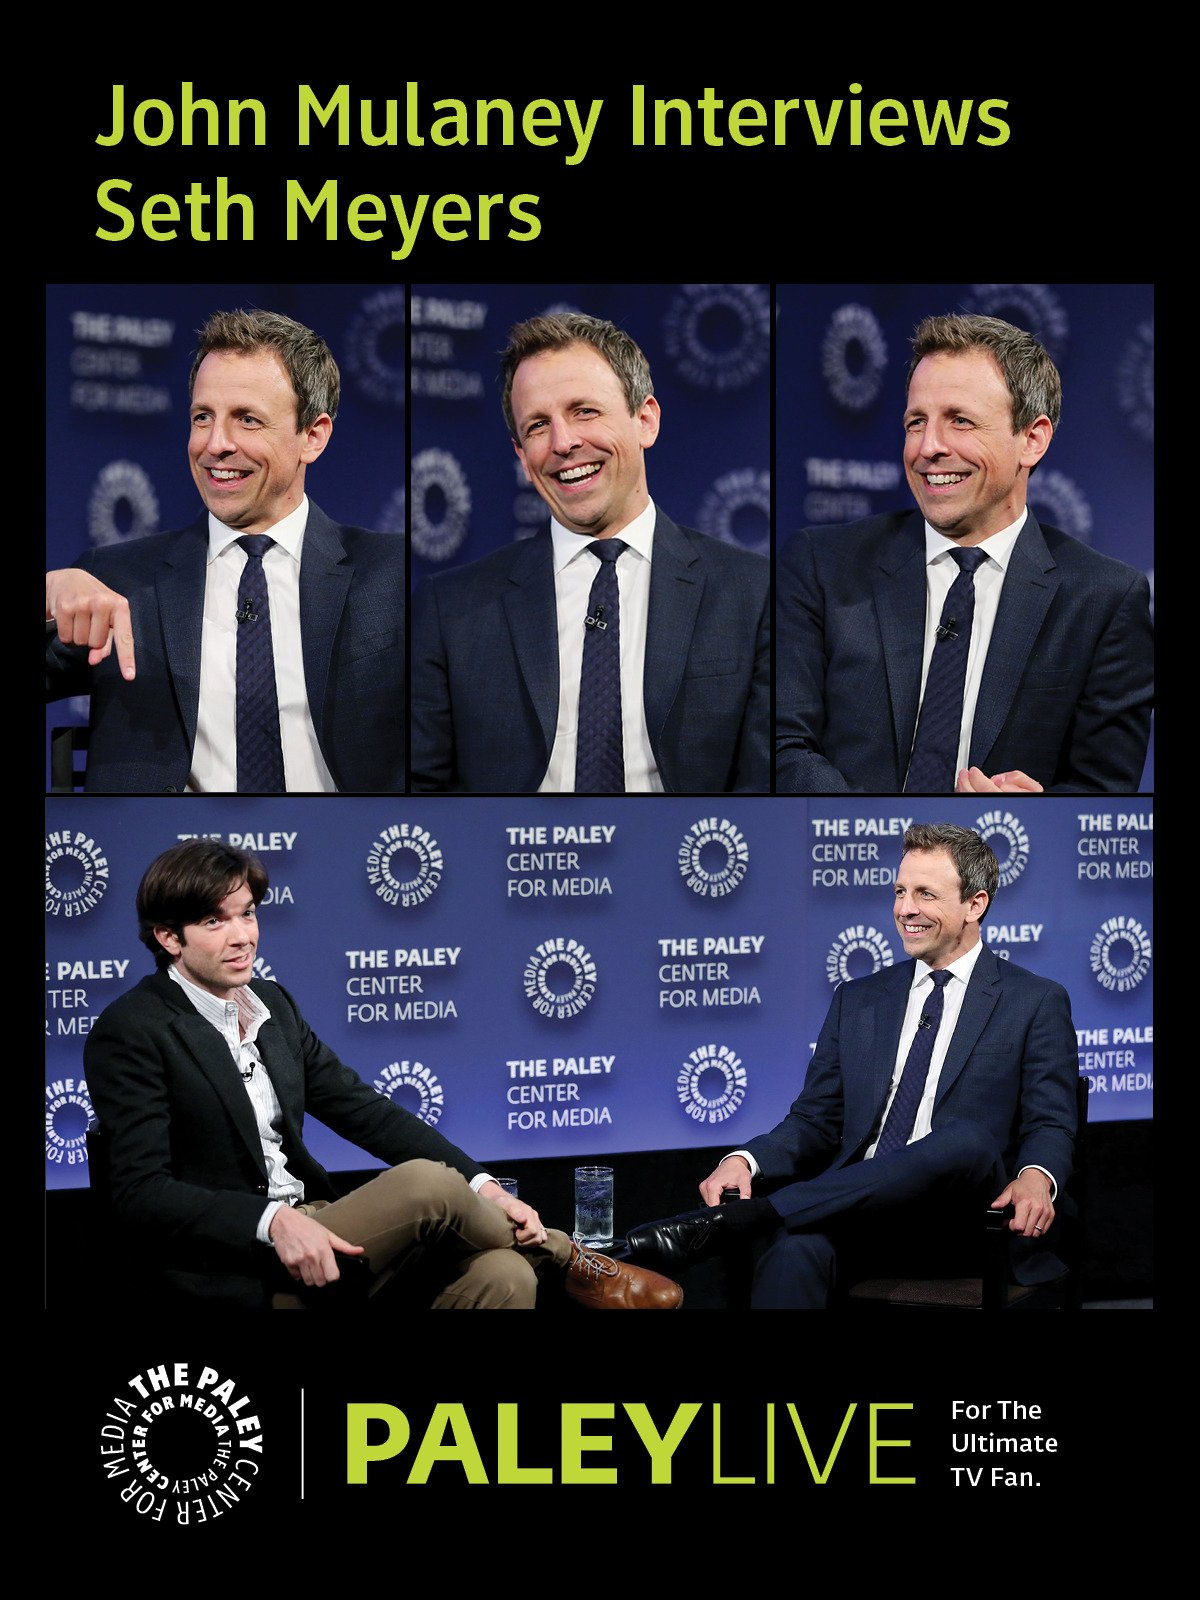 John Mulaney Interviews Seth Meyers PaleyLive